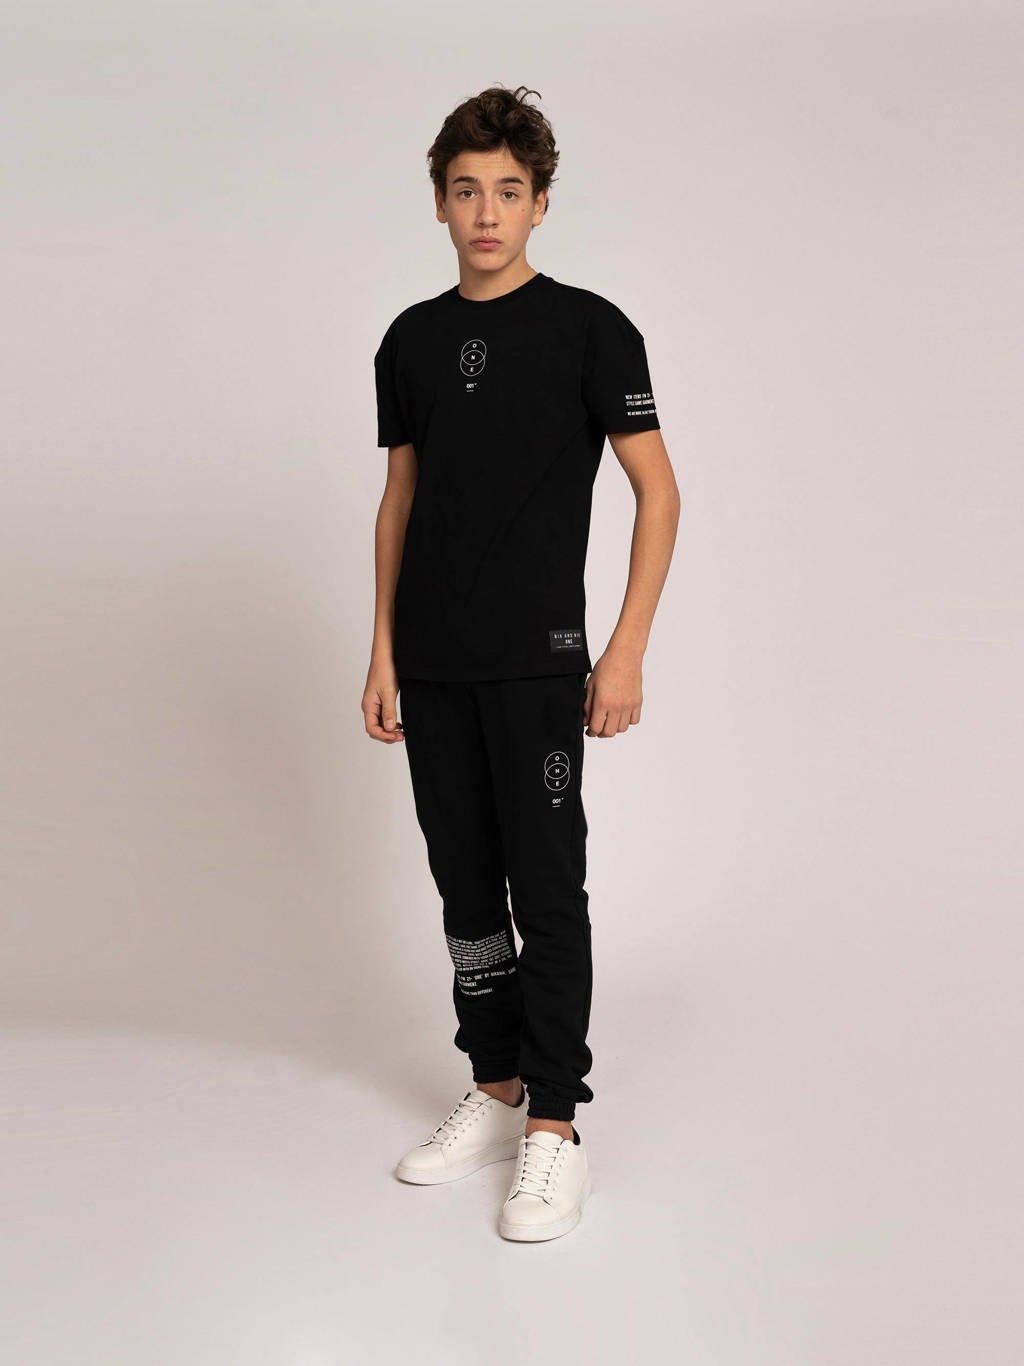 NIK&NIK joggingbroek Jip One met printopdruk zwart, Zwart